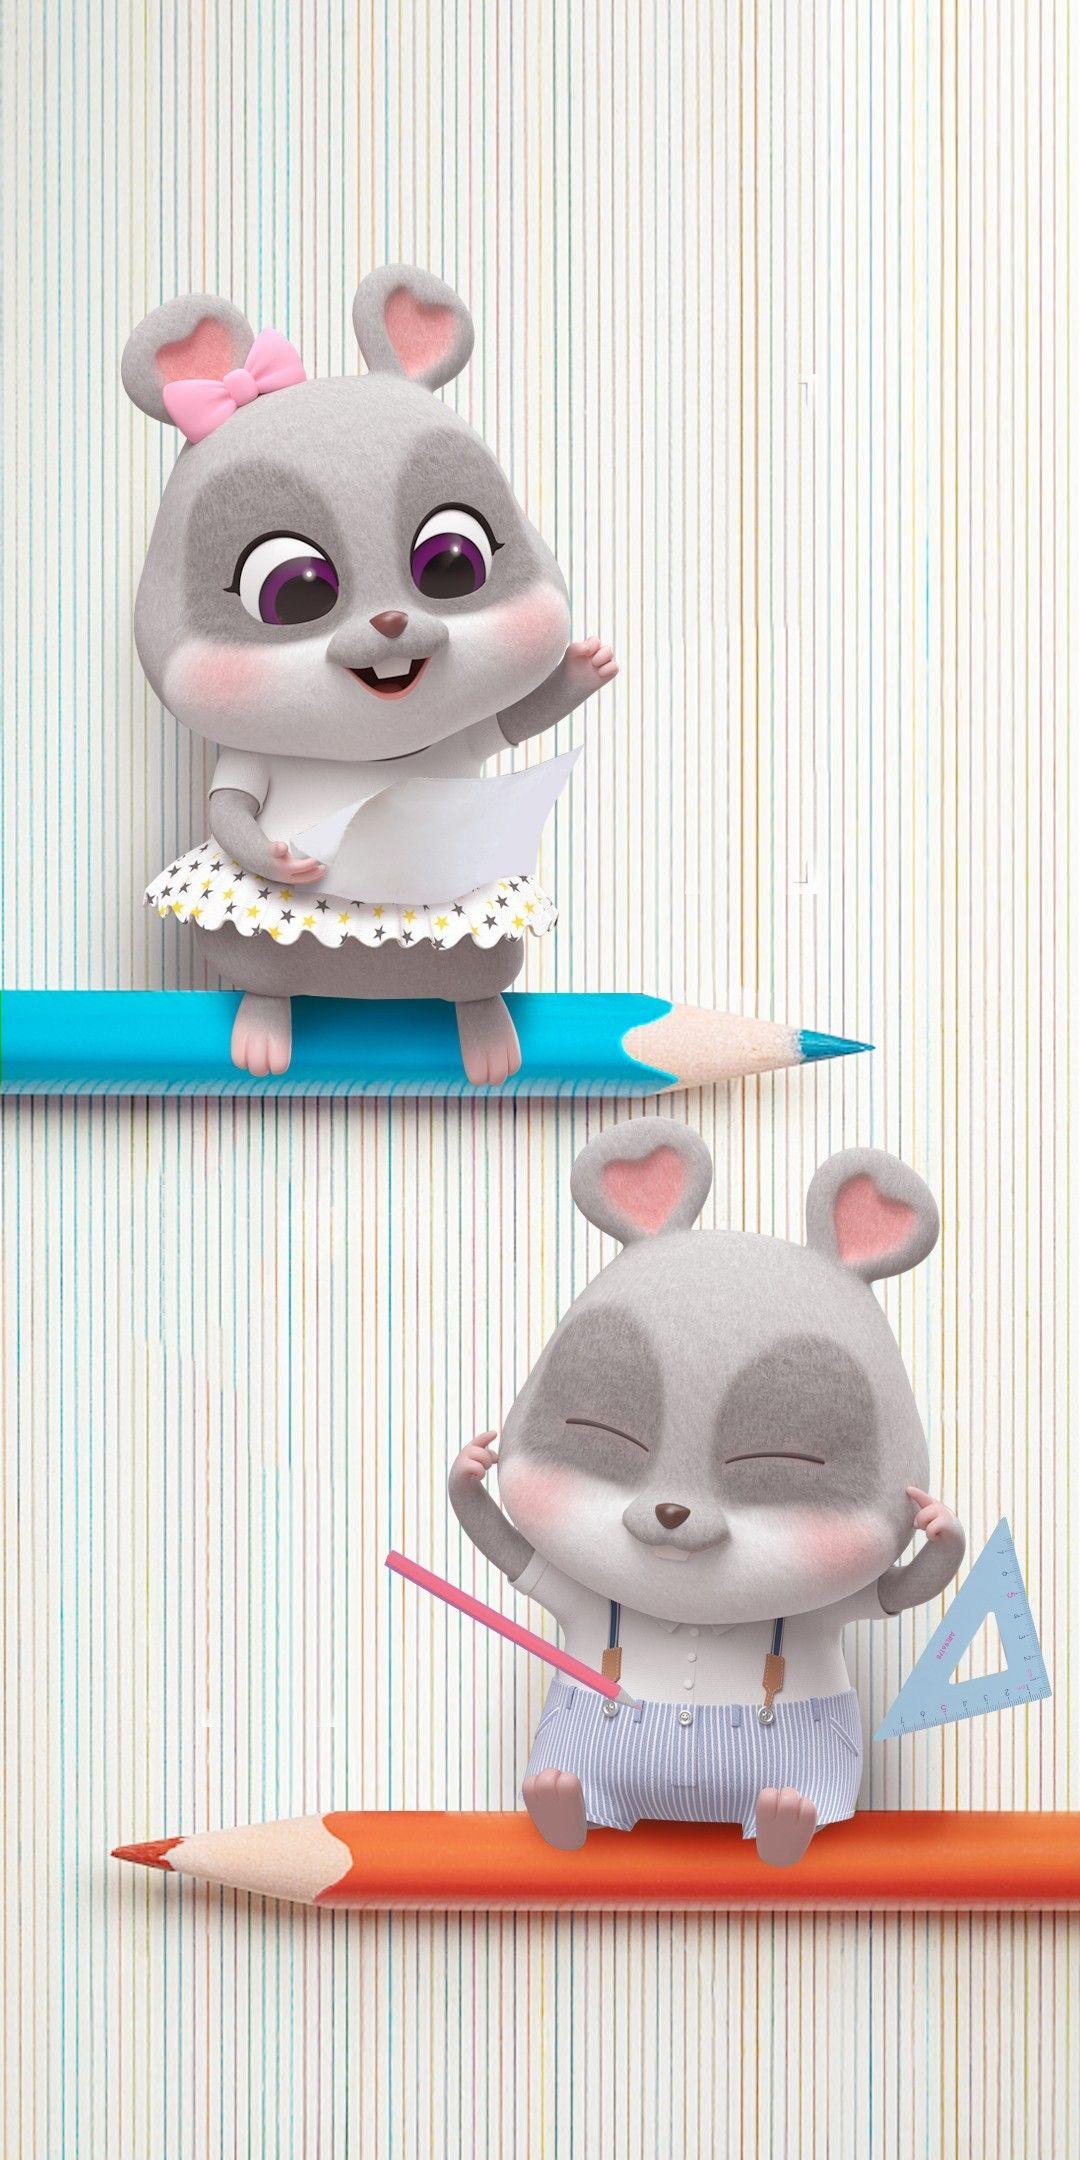 Mice Cute Disney Wallpaper Cute Emoji Wallpaper Cute Couple Wallpaper